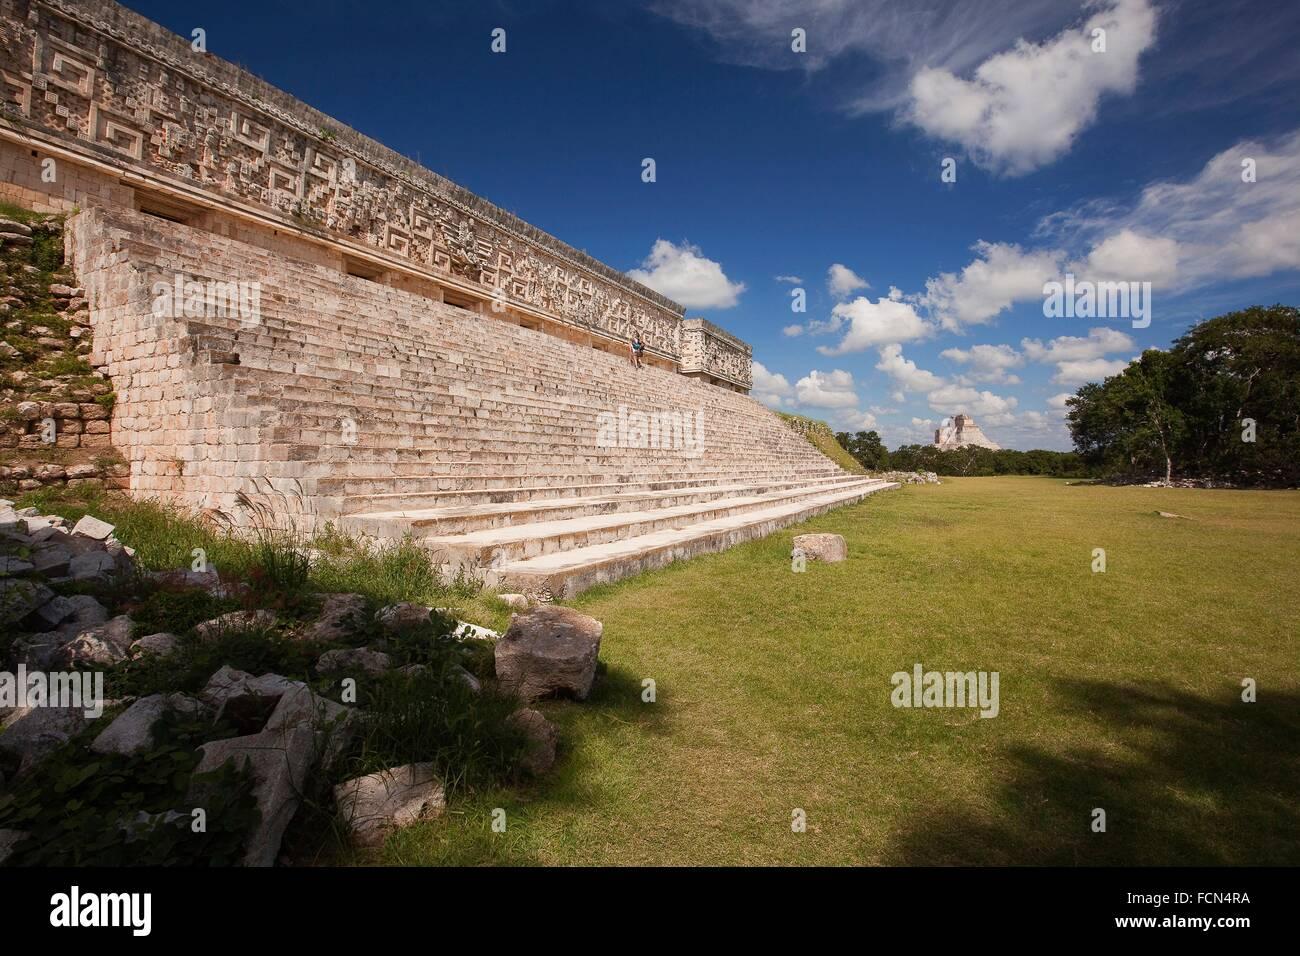 Palacio del Gobernador-Governer´s Palace, Maya archeological site Uxmal, Yucatan Province, Mexico, Central - Stock Image